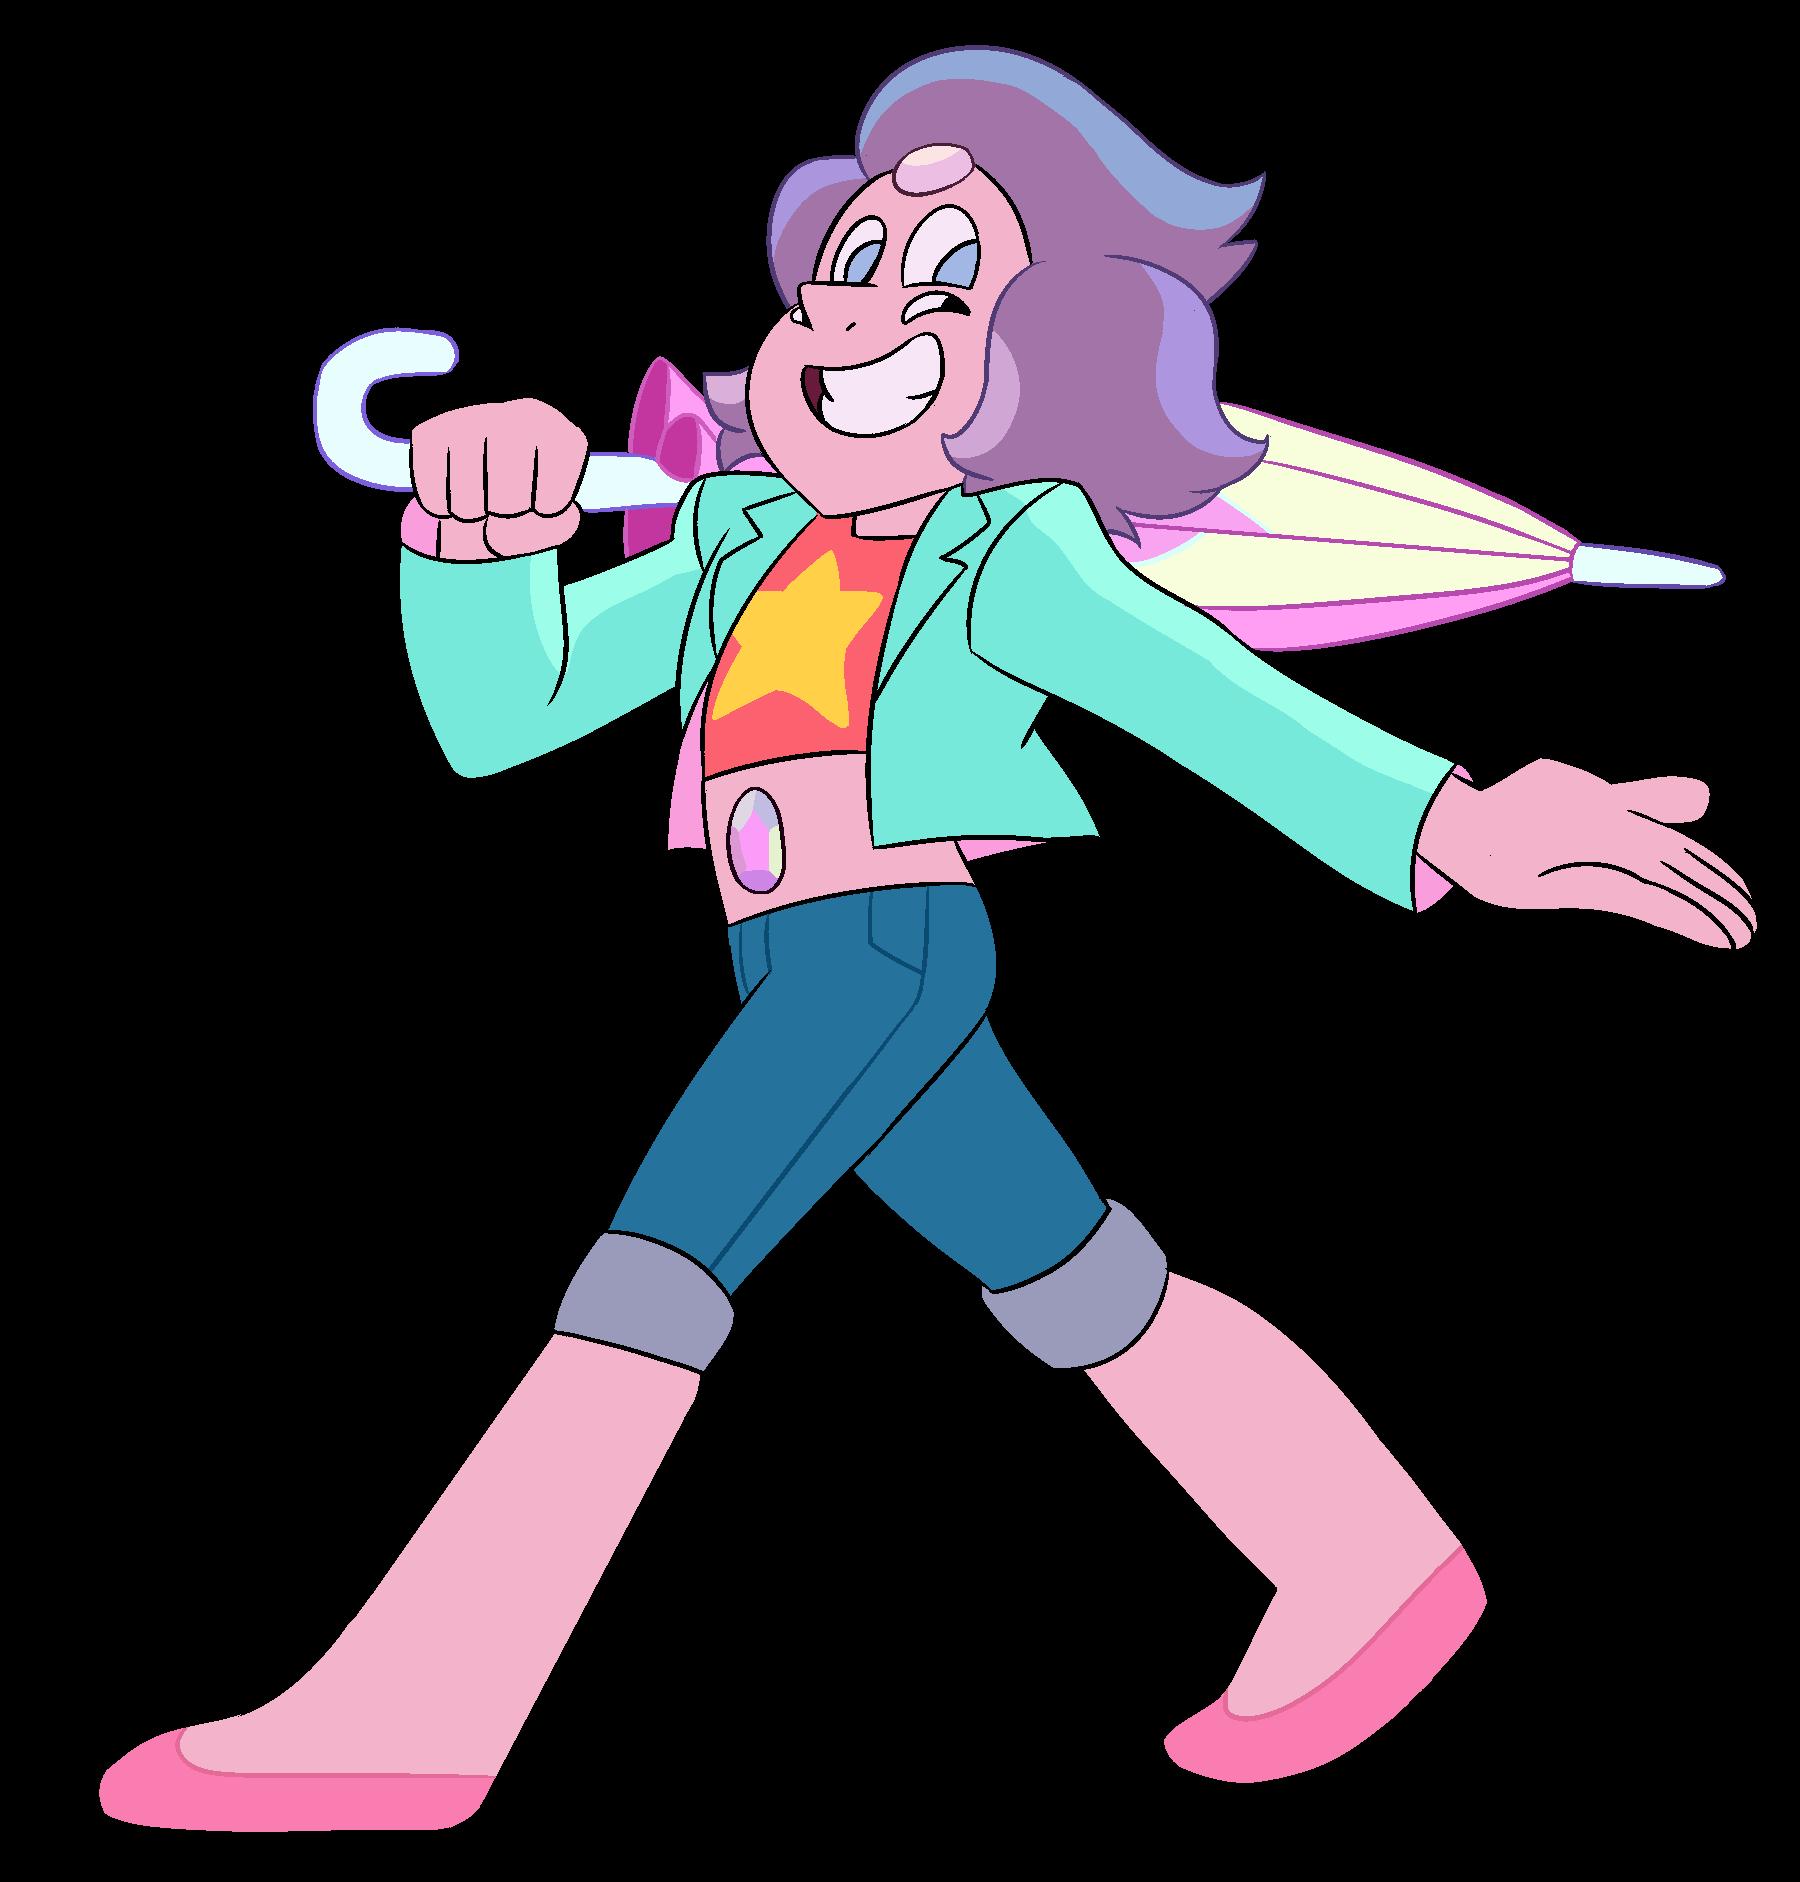 Steven universe change your mind stream